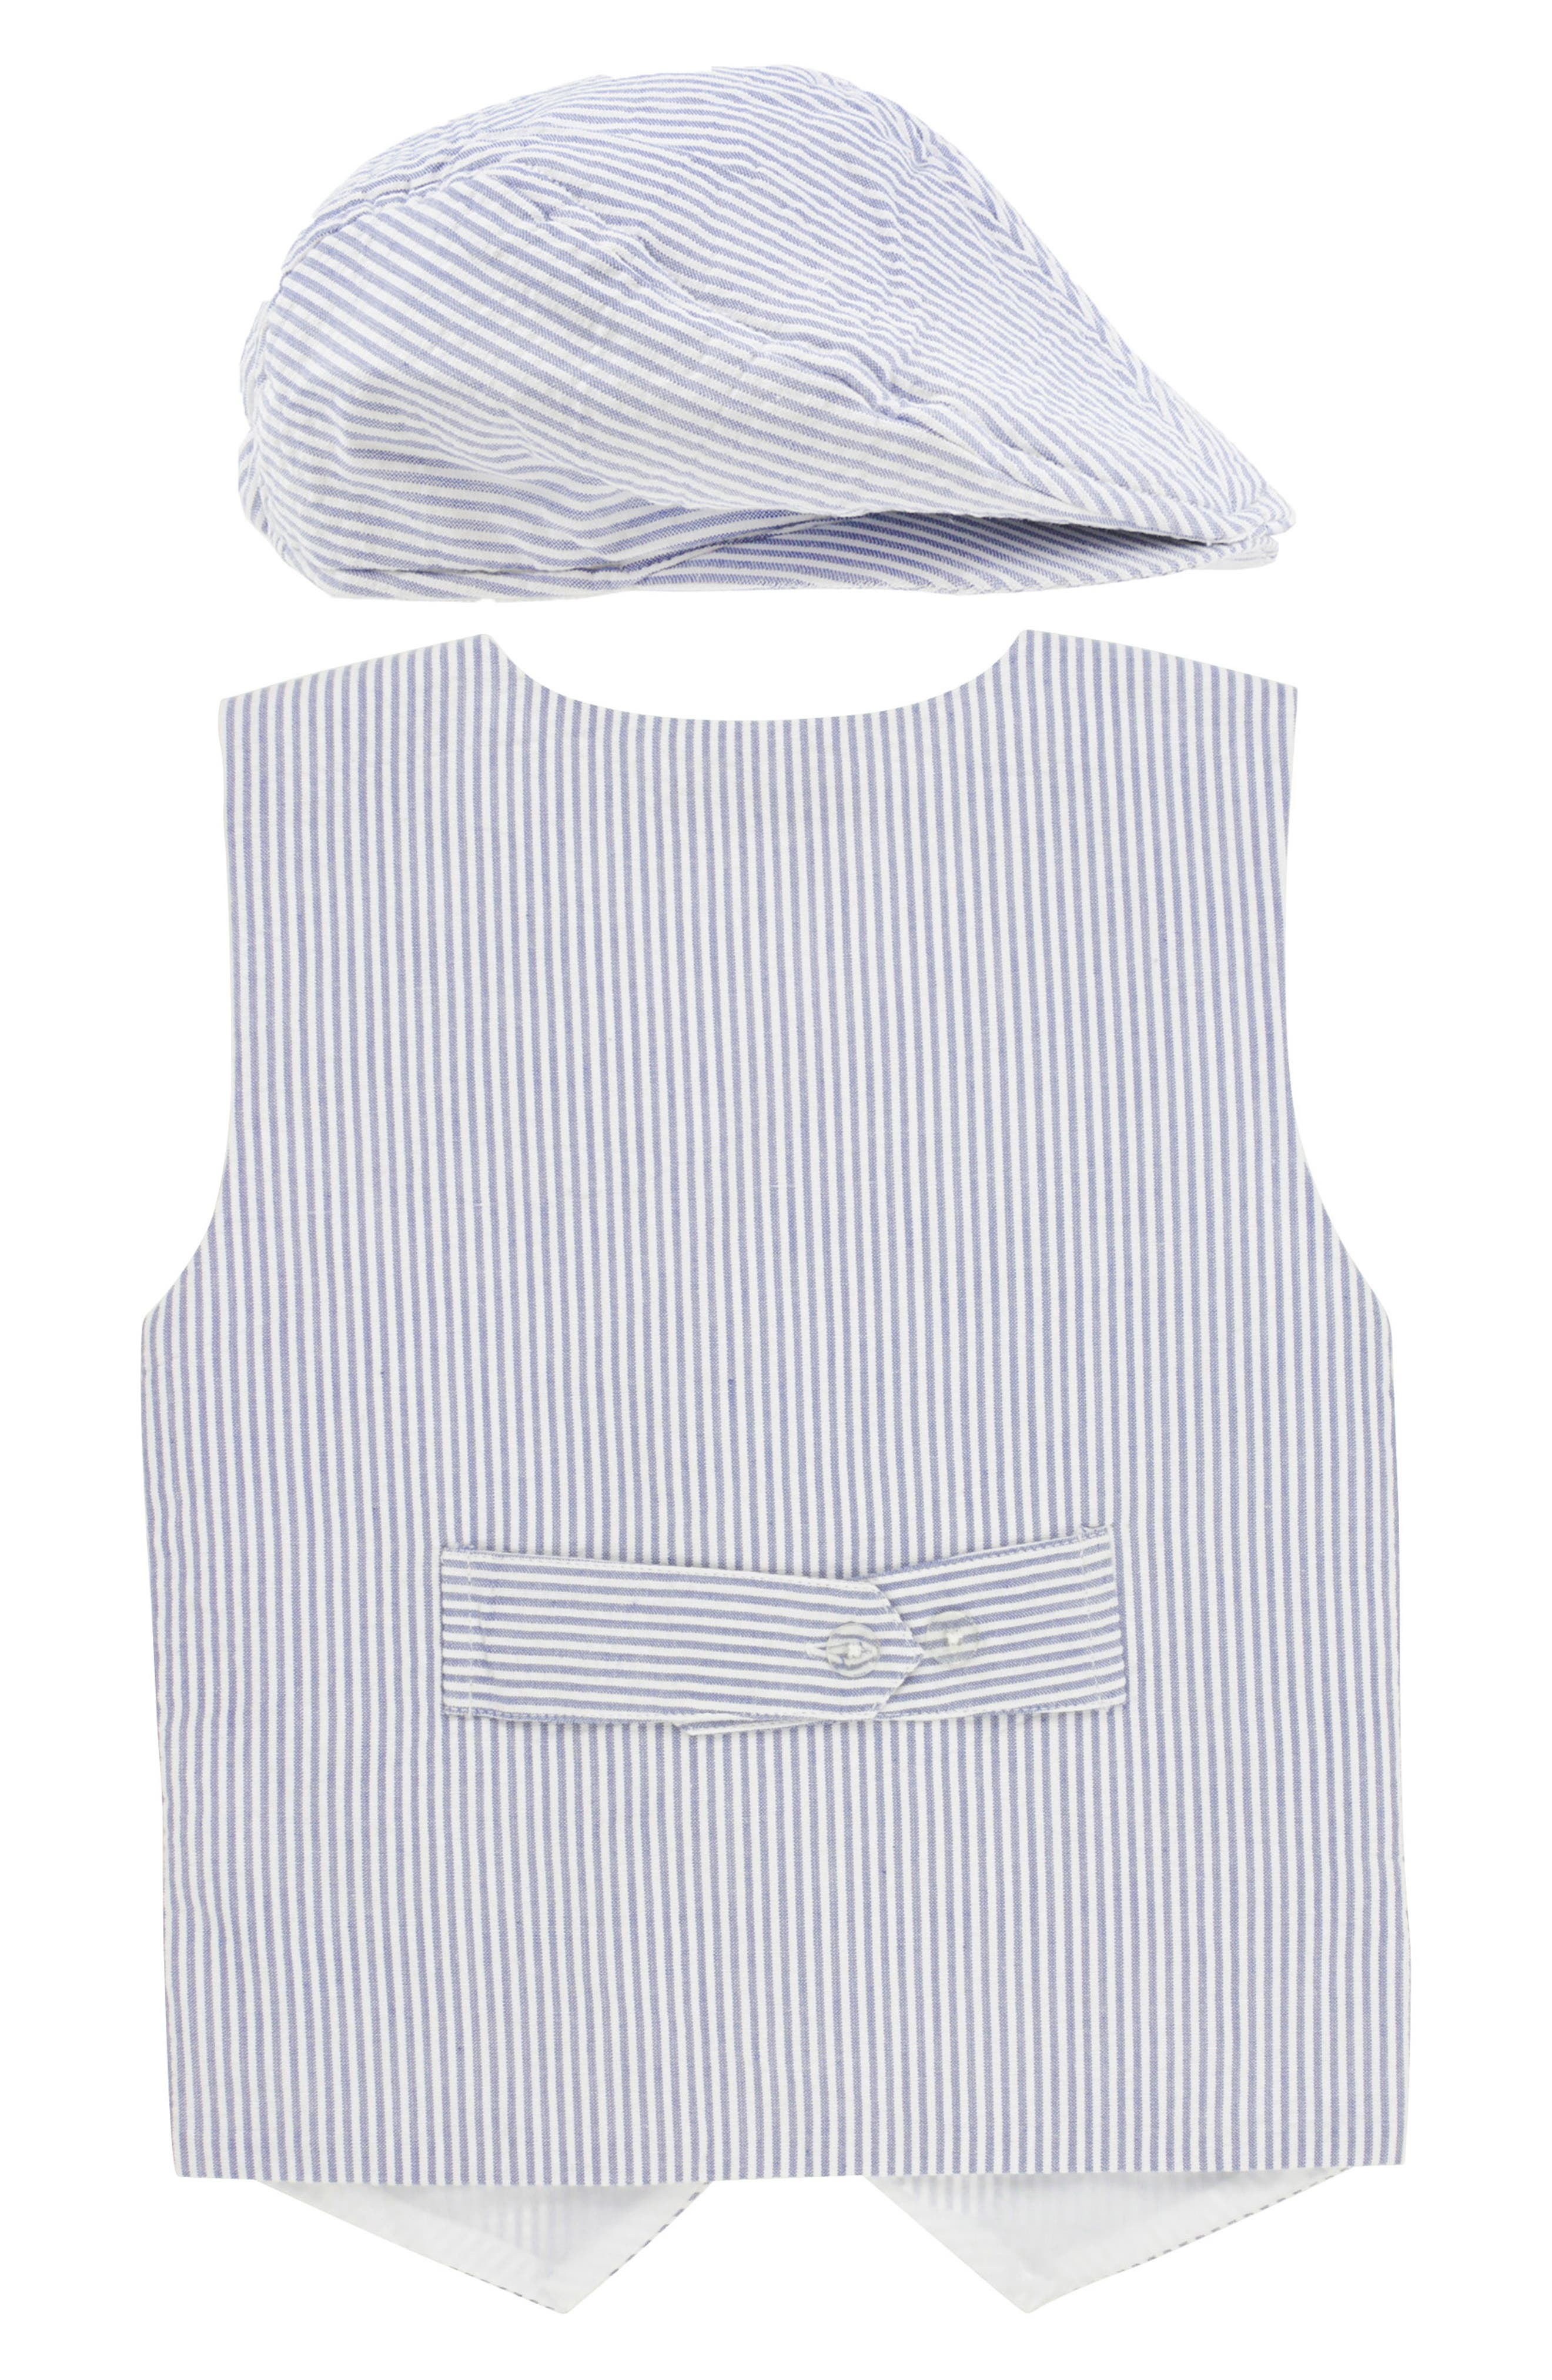 Seersucker Vest & Shorts Set,                             Alternate thumbnail 2, color,                             BLUE